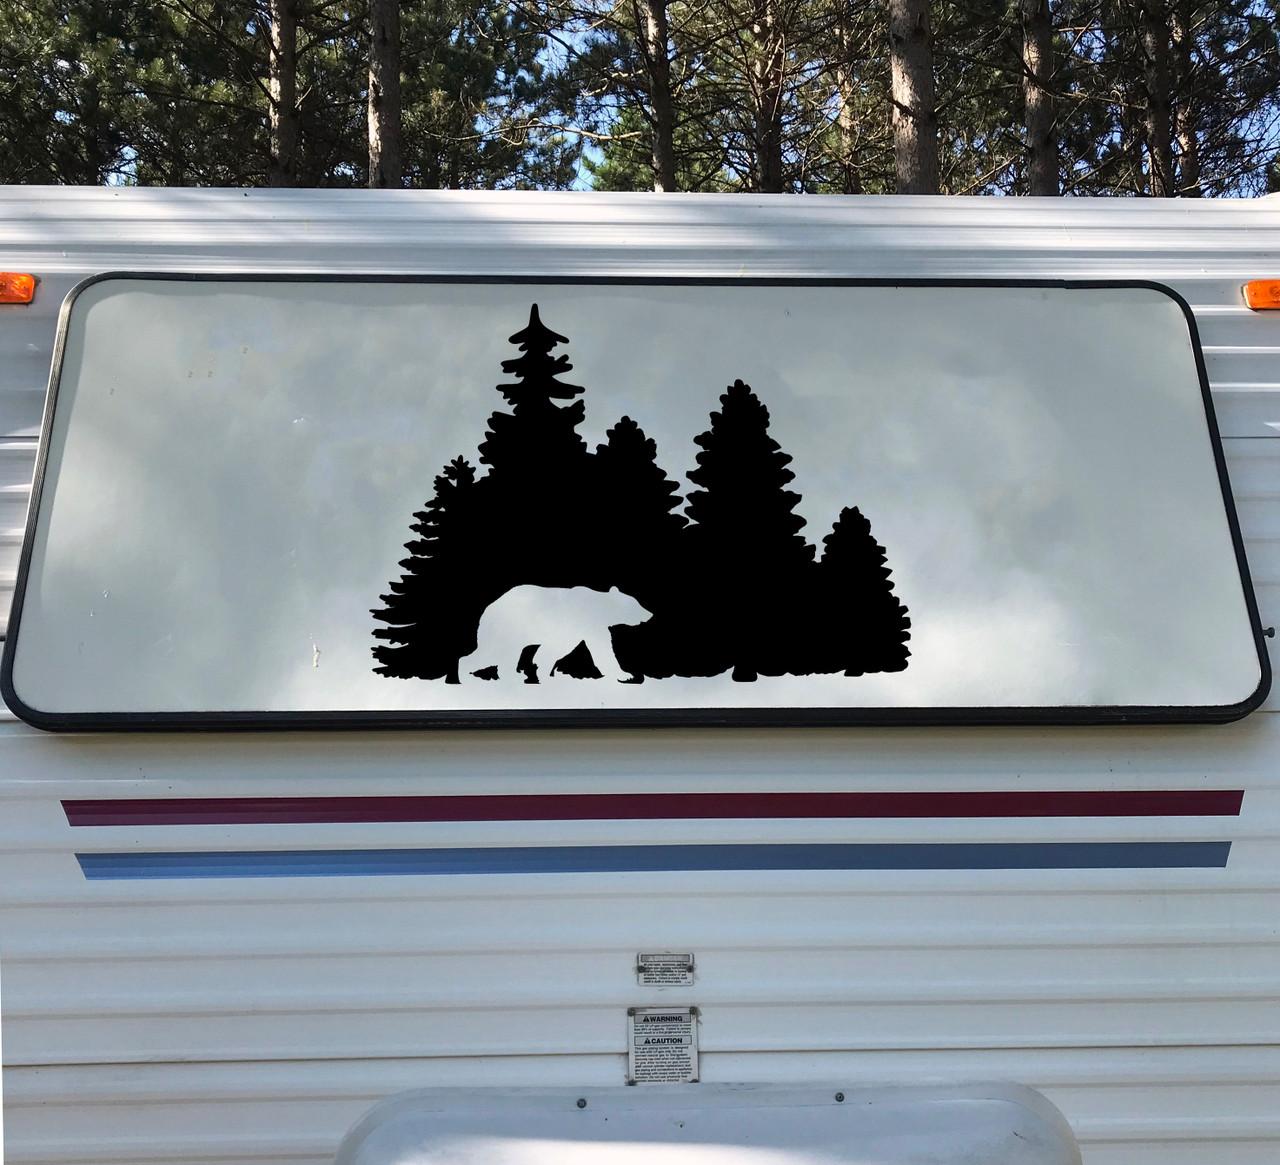 Bear in Treeline V1 Vinyl Decal - Forest Grizzly Trees - Die Cut Sticker